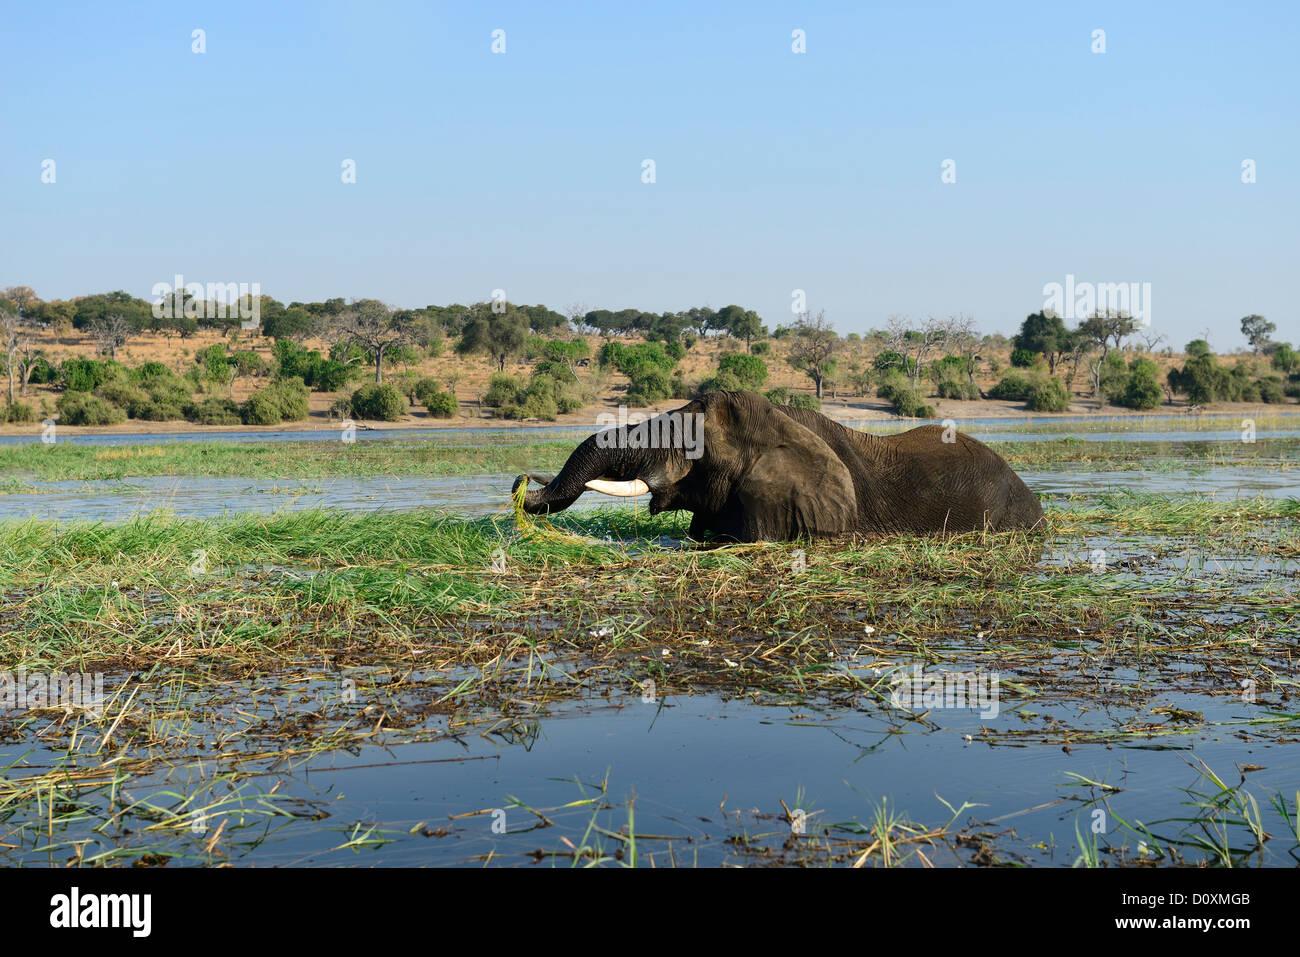 Africa, Botswana, Chobe, National Park, elephant, animal, safari, water, river, animal, mammal, Loxodonta african, - Stock Image